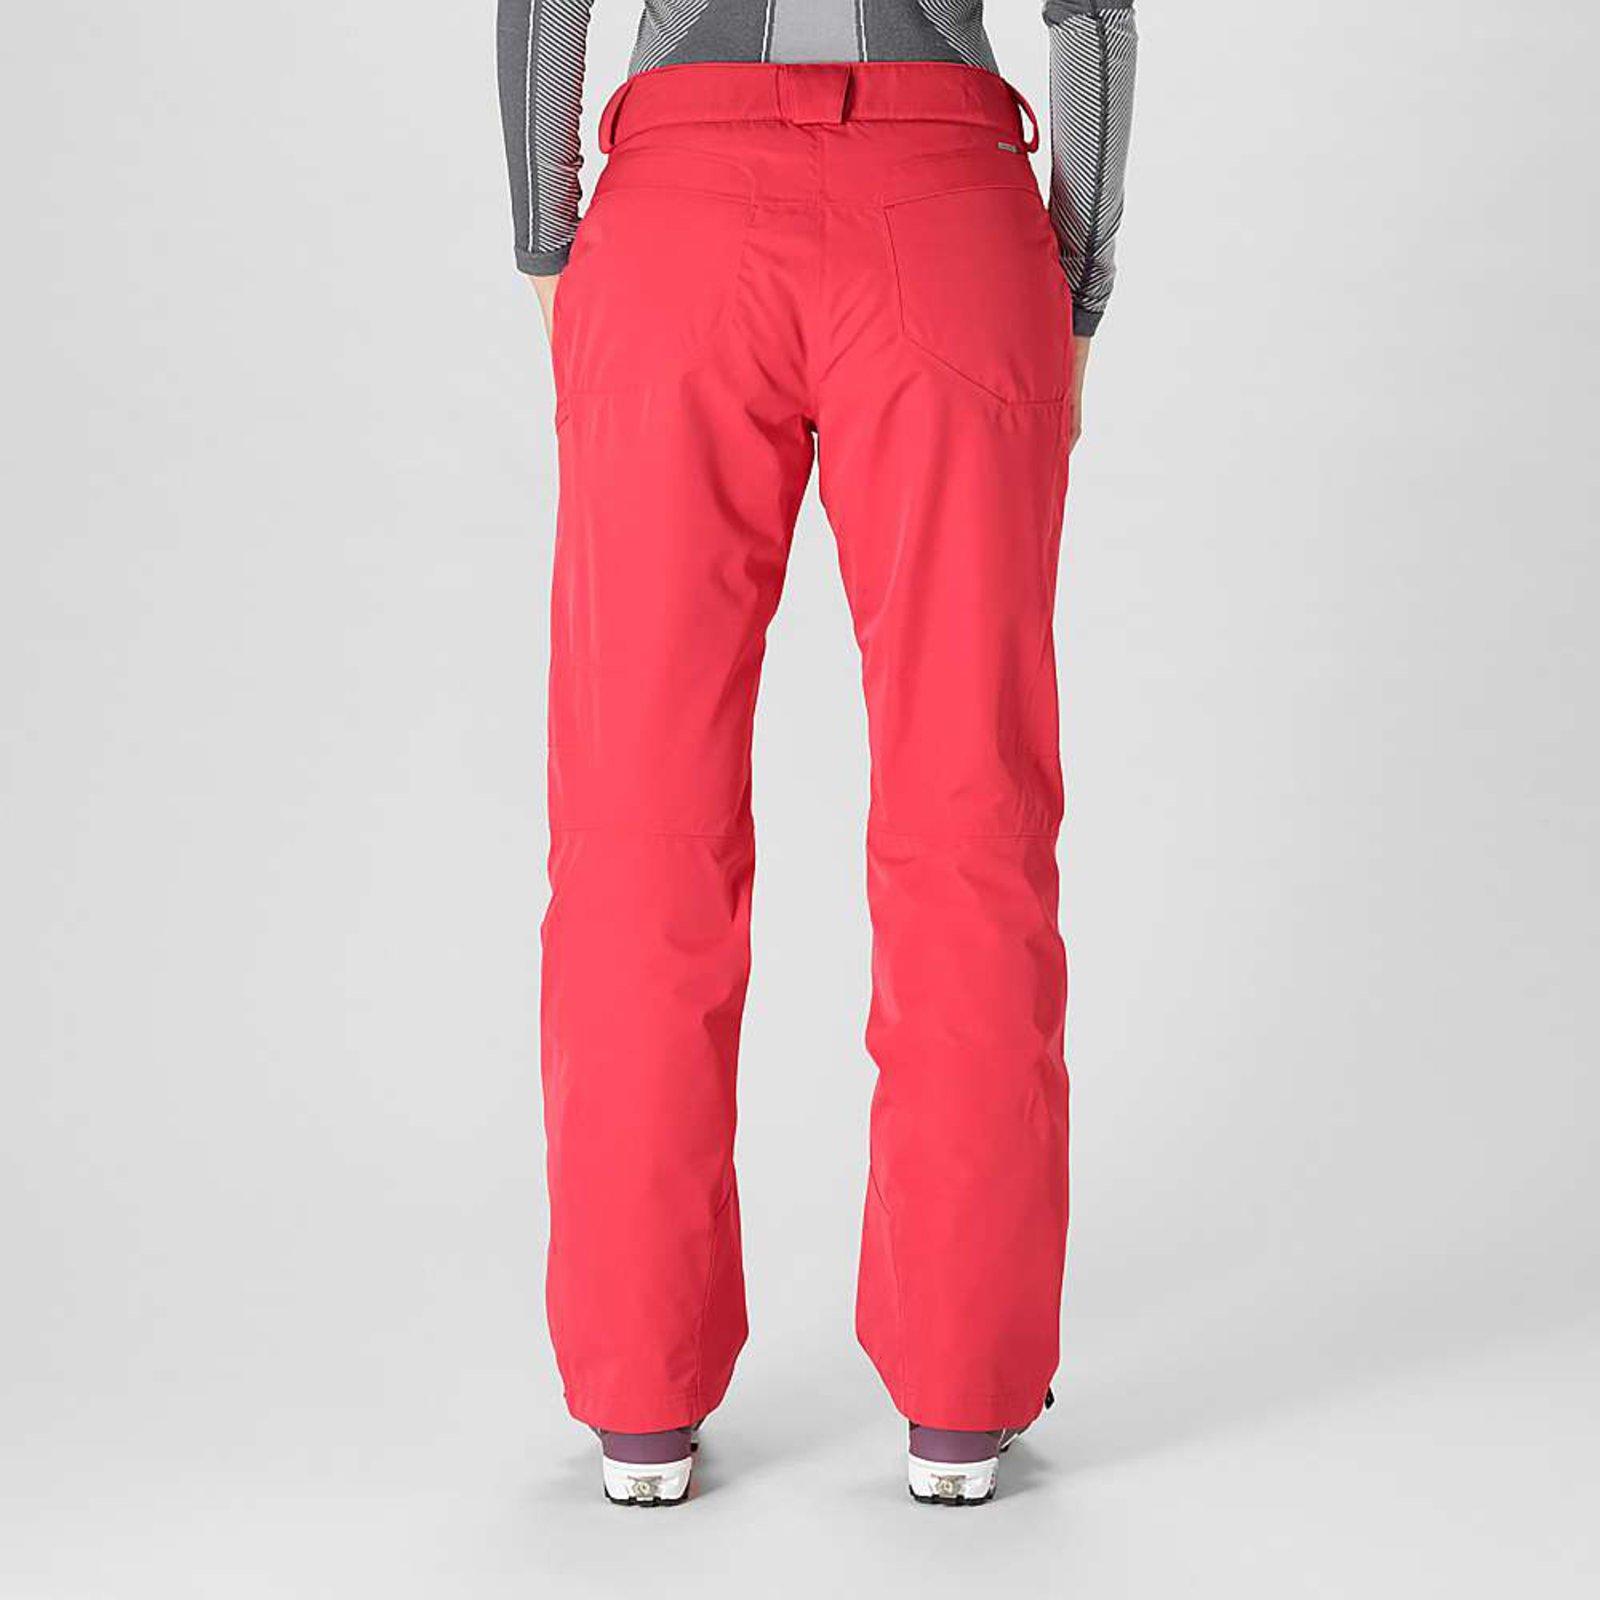 Lyžařské kalhoty SALOMON FANTASY PANT W. Doprava zdarma 95615254a2